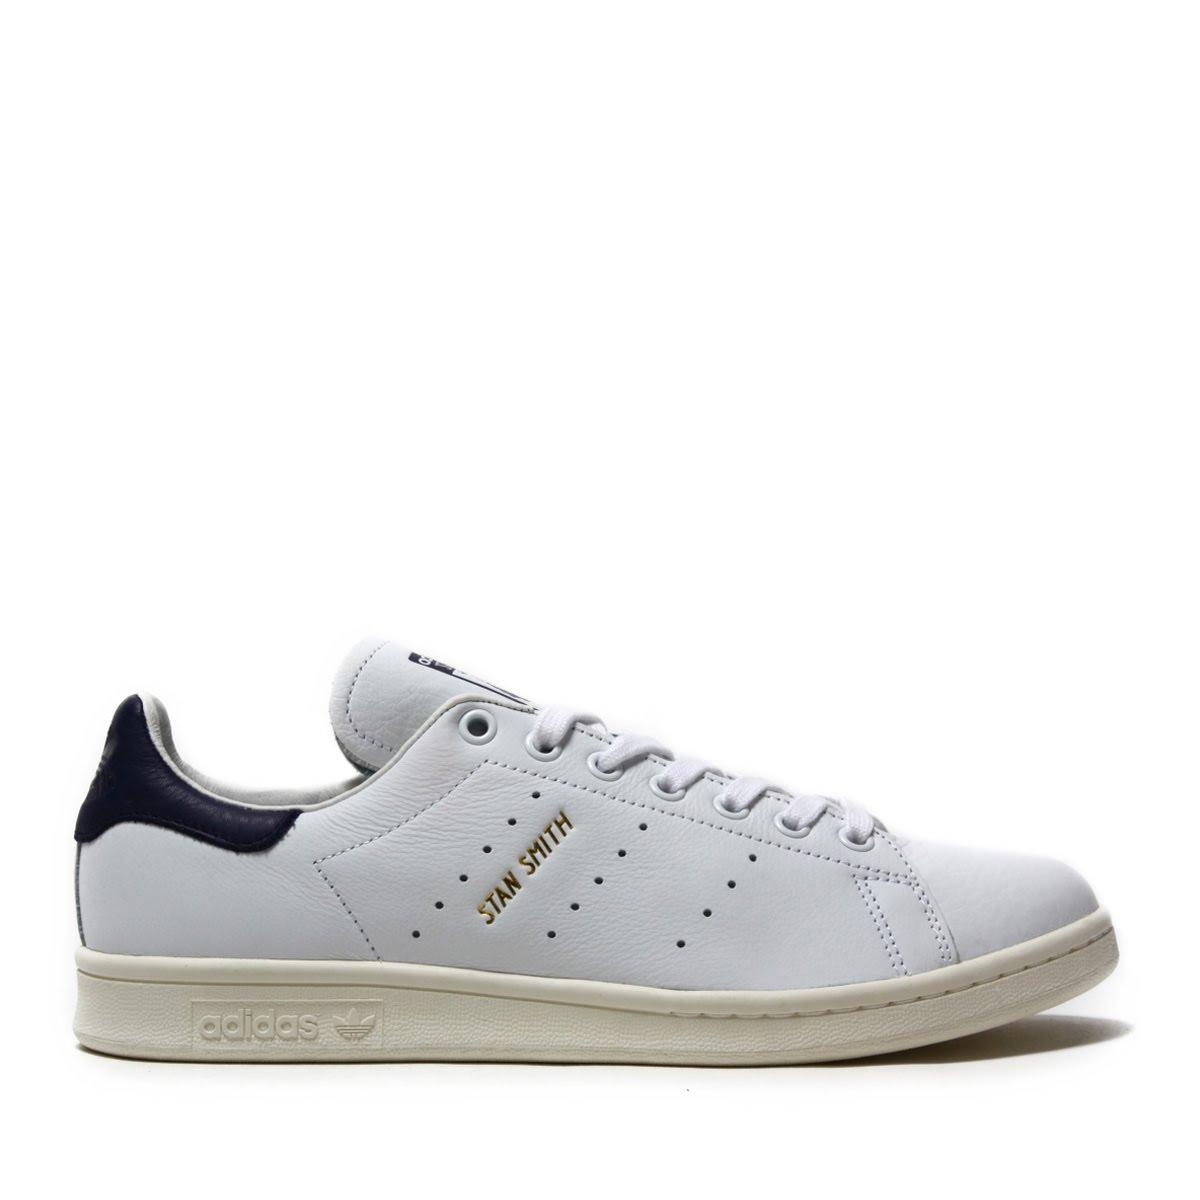 adidas Originals STAN SMITH (Running White/Running White/Noble Ink) 【メンズ】【レディース】【スニーカー】【20SS-I】